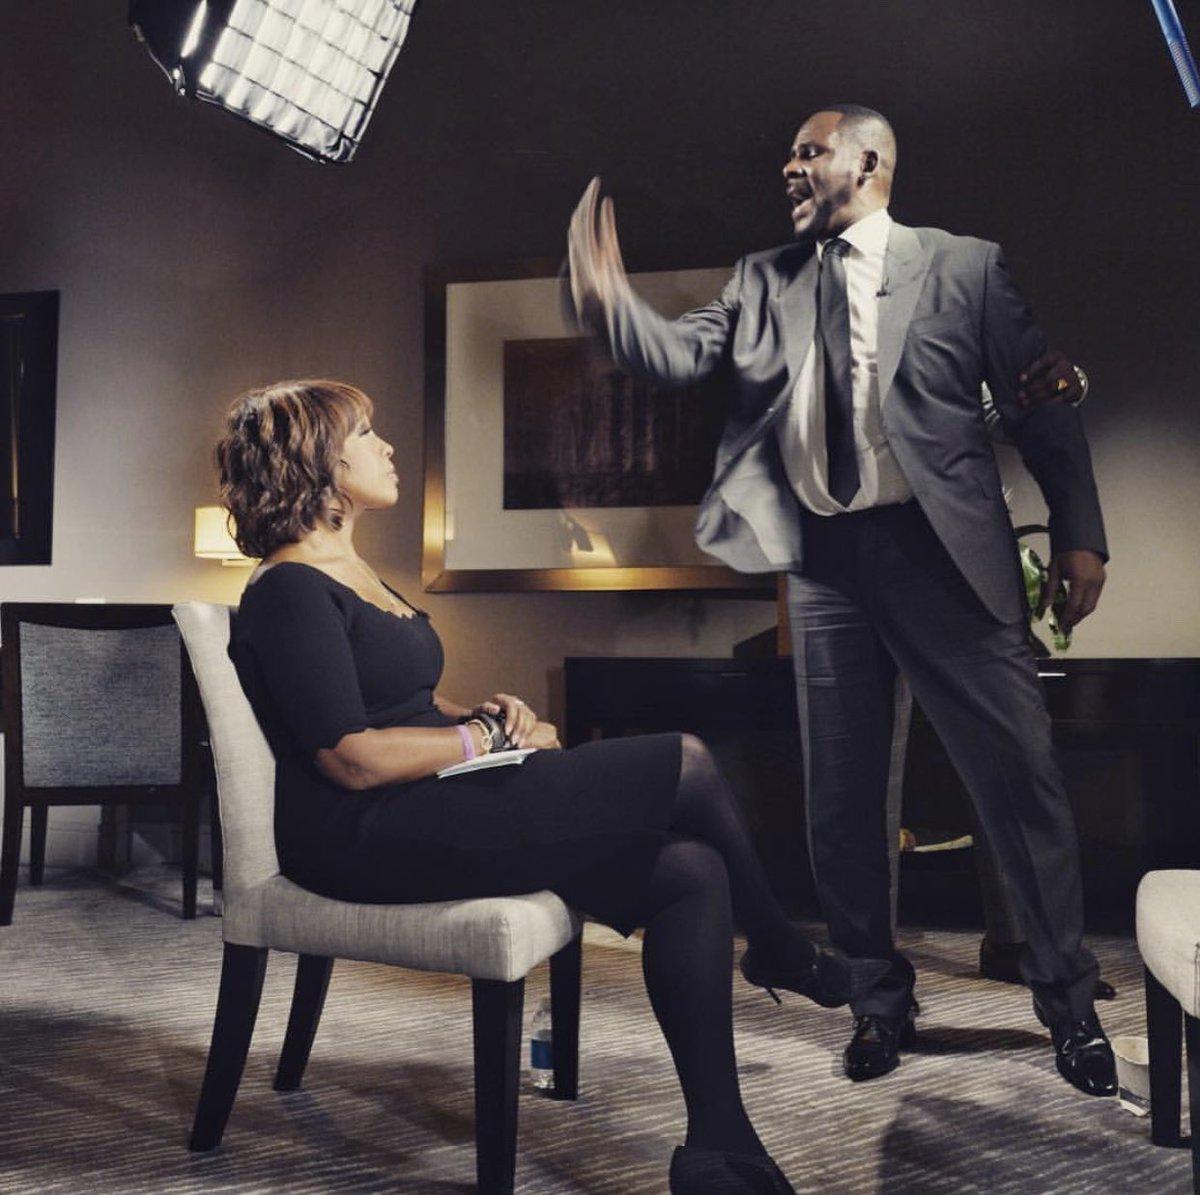 Gayle King interviews R. Kelly